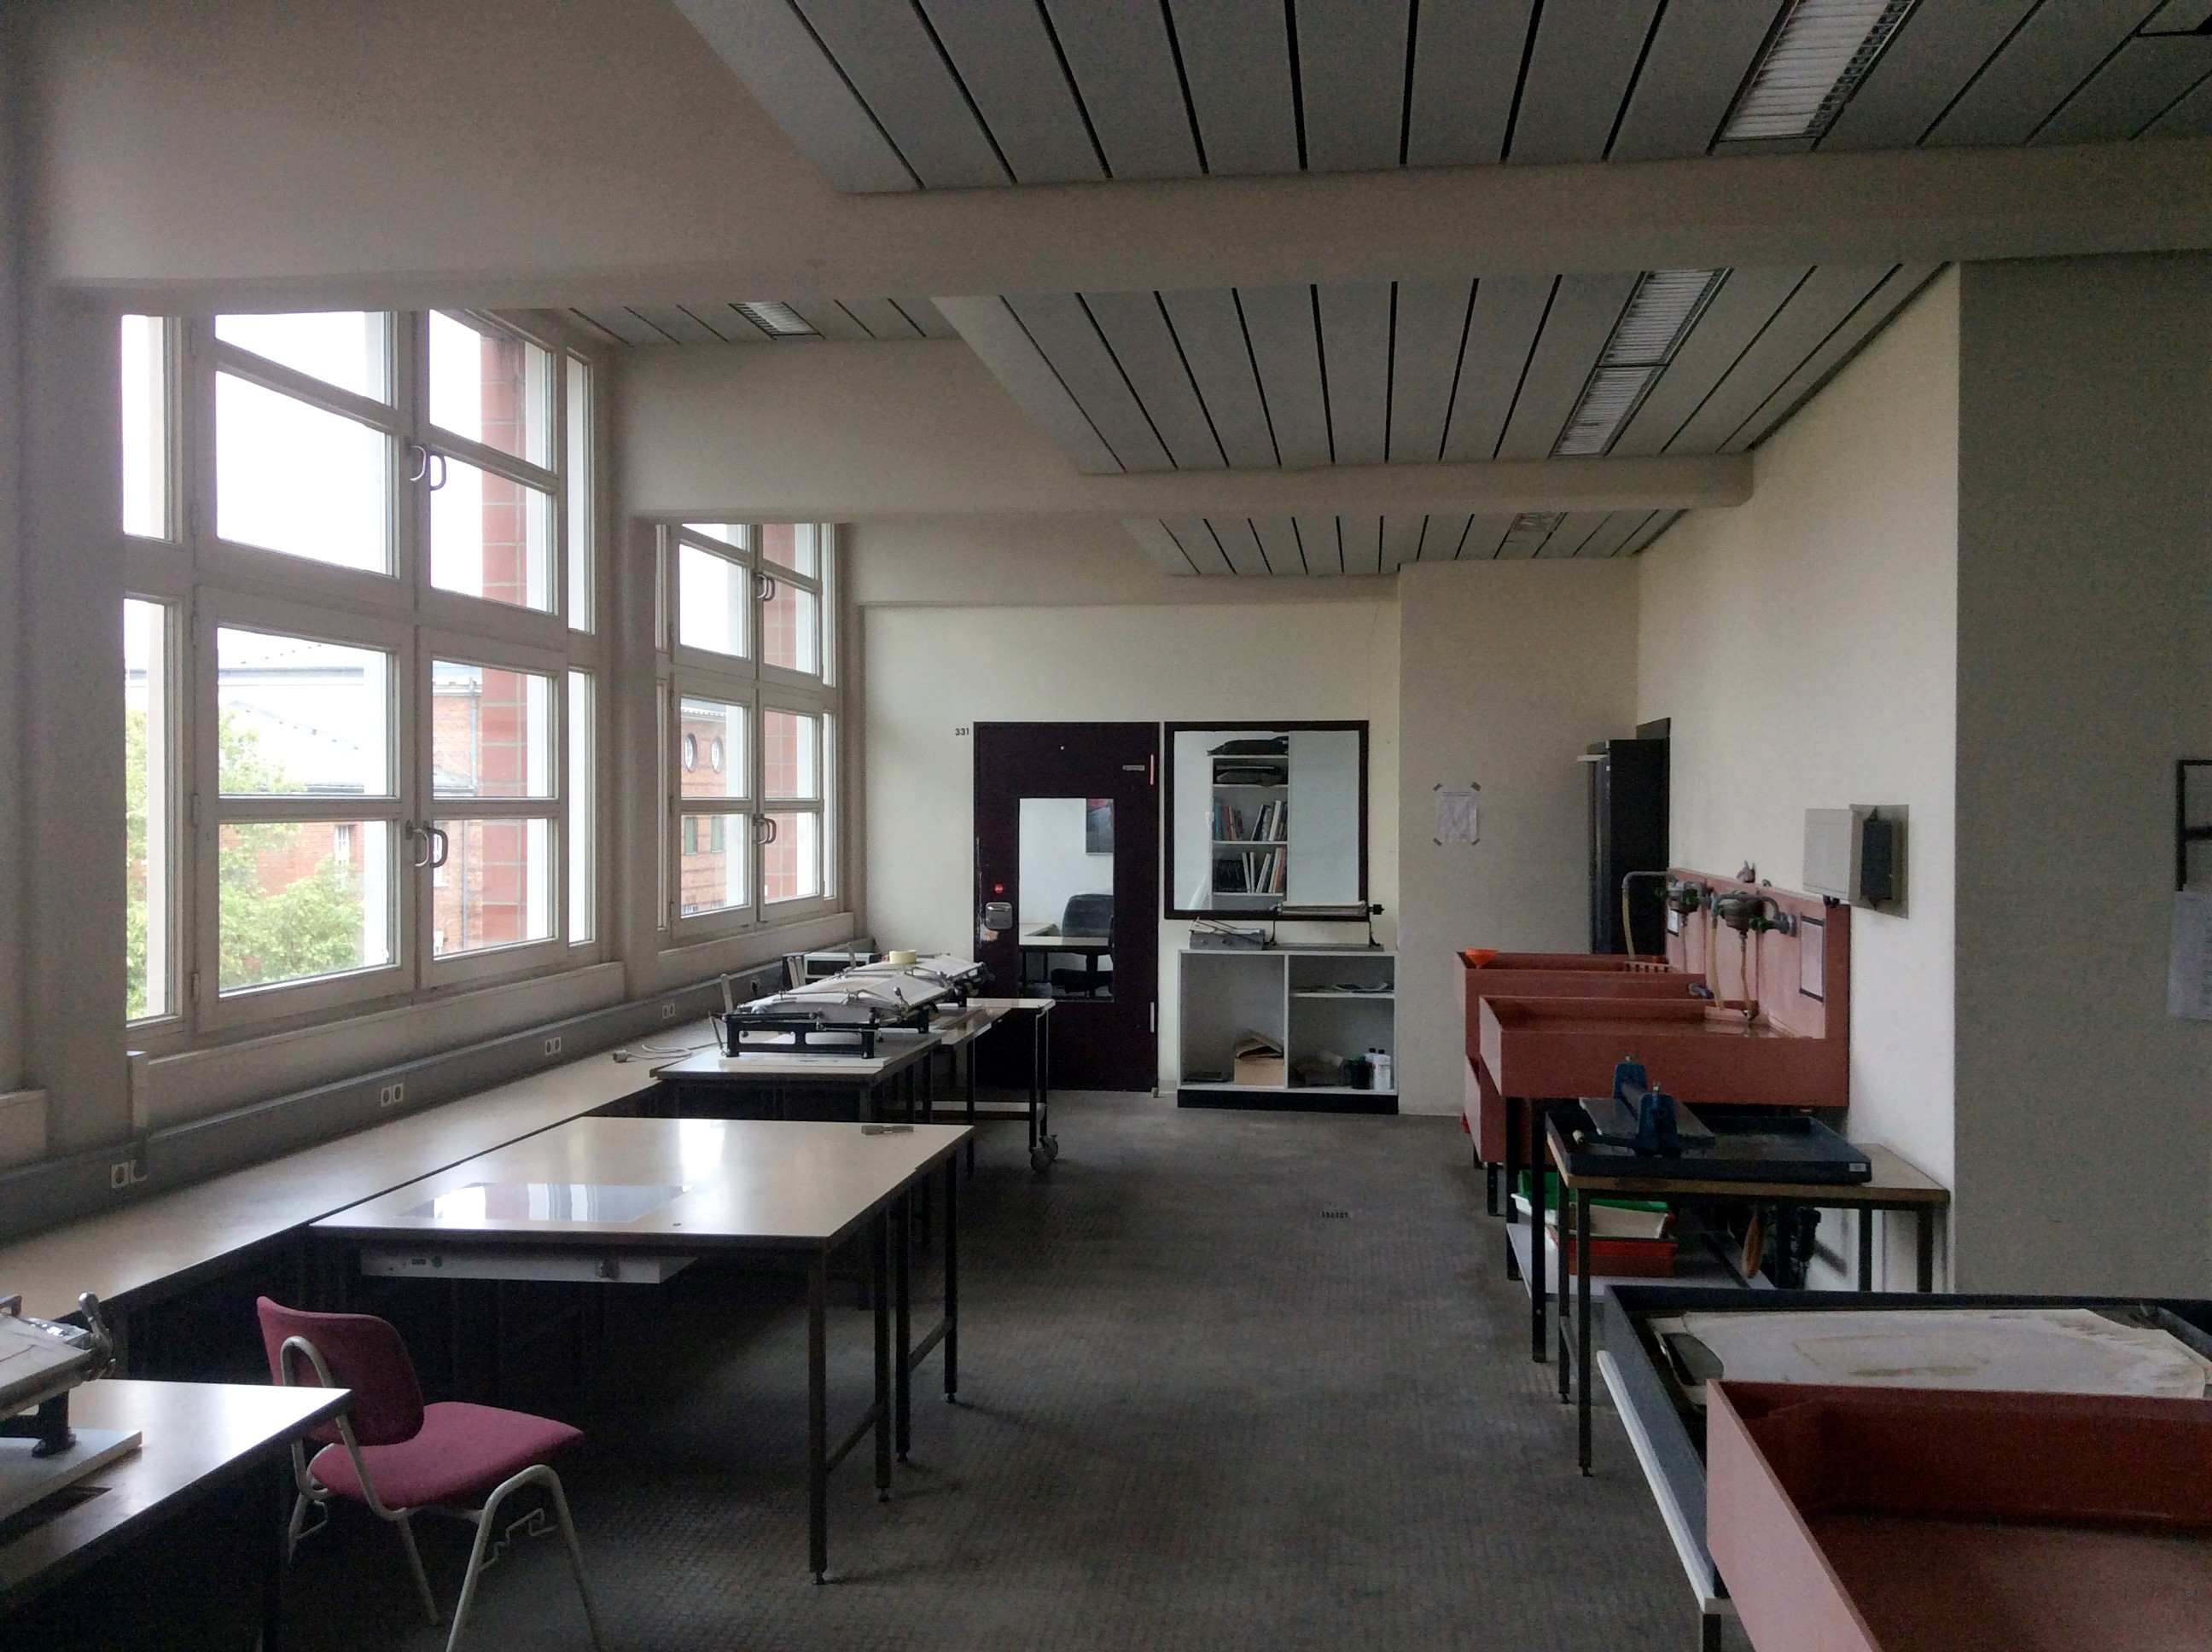 Neue digitale Fotolabore im Lette Verein Berlin